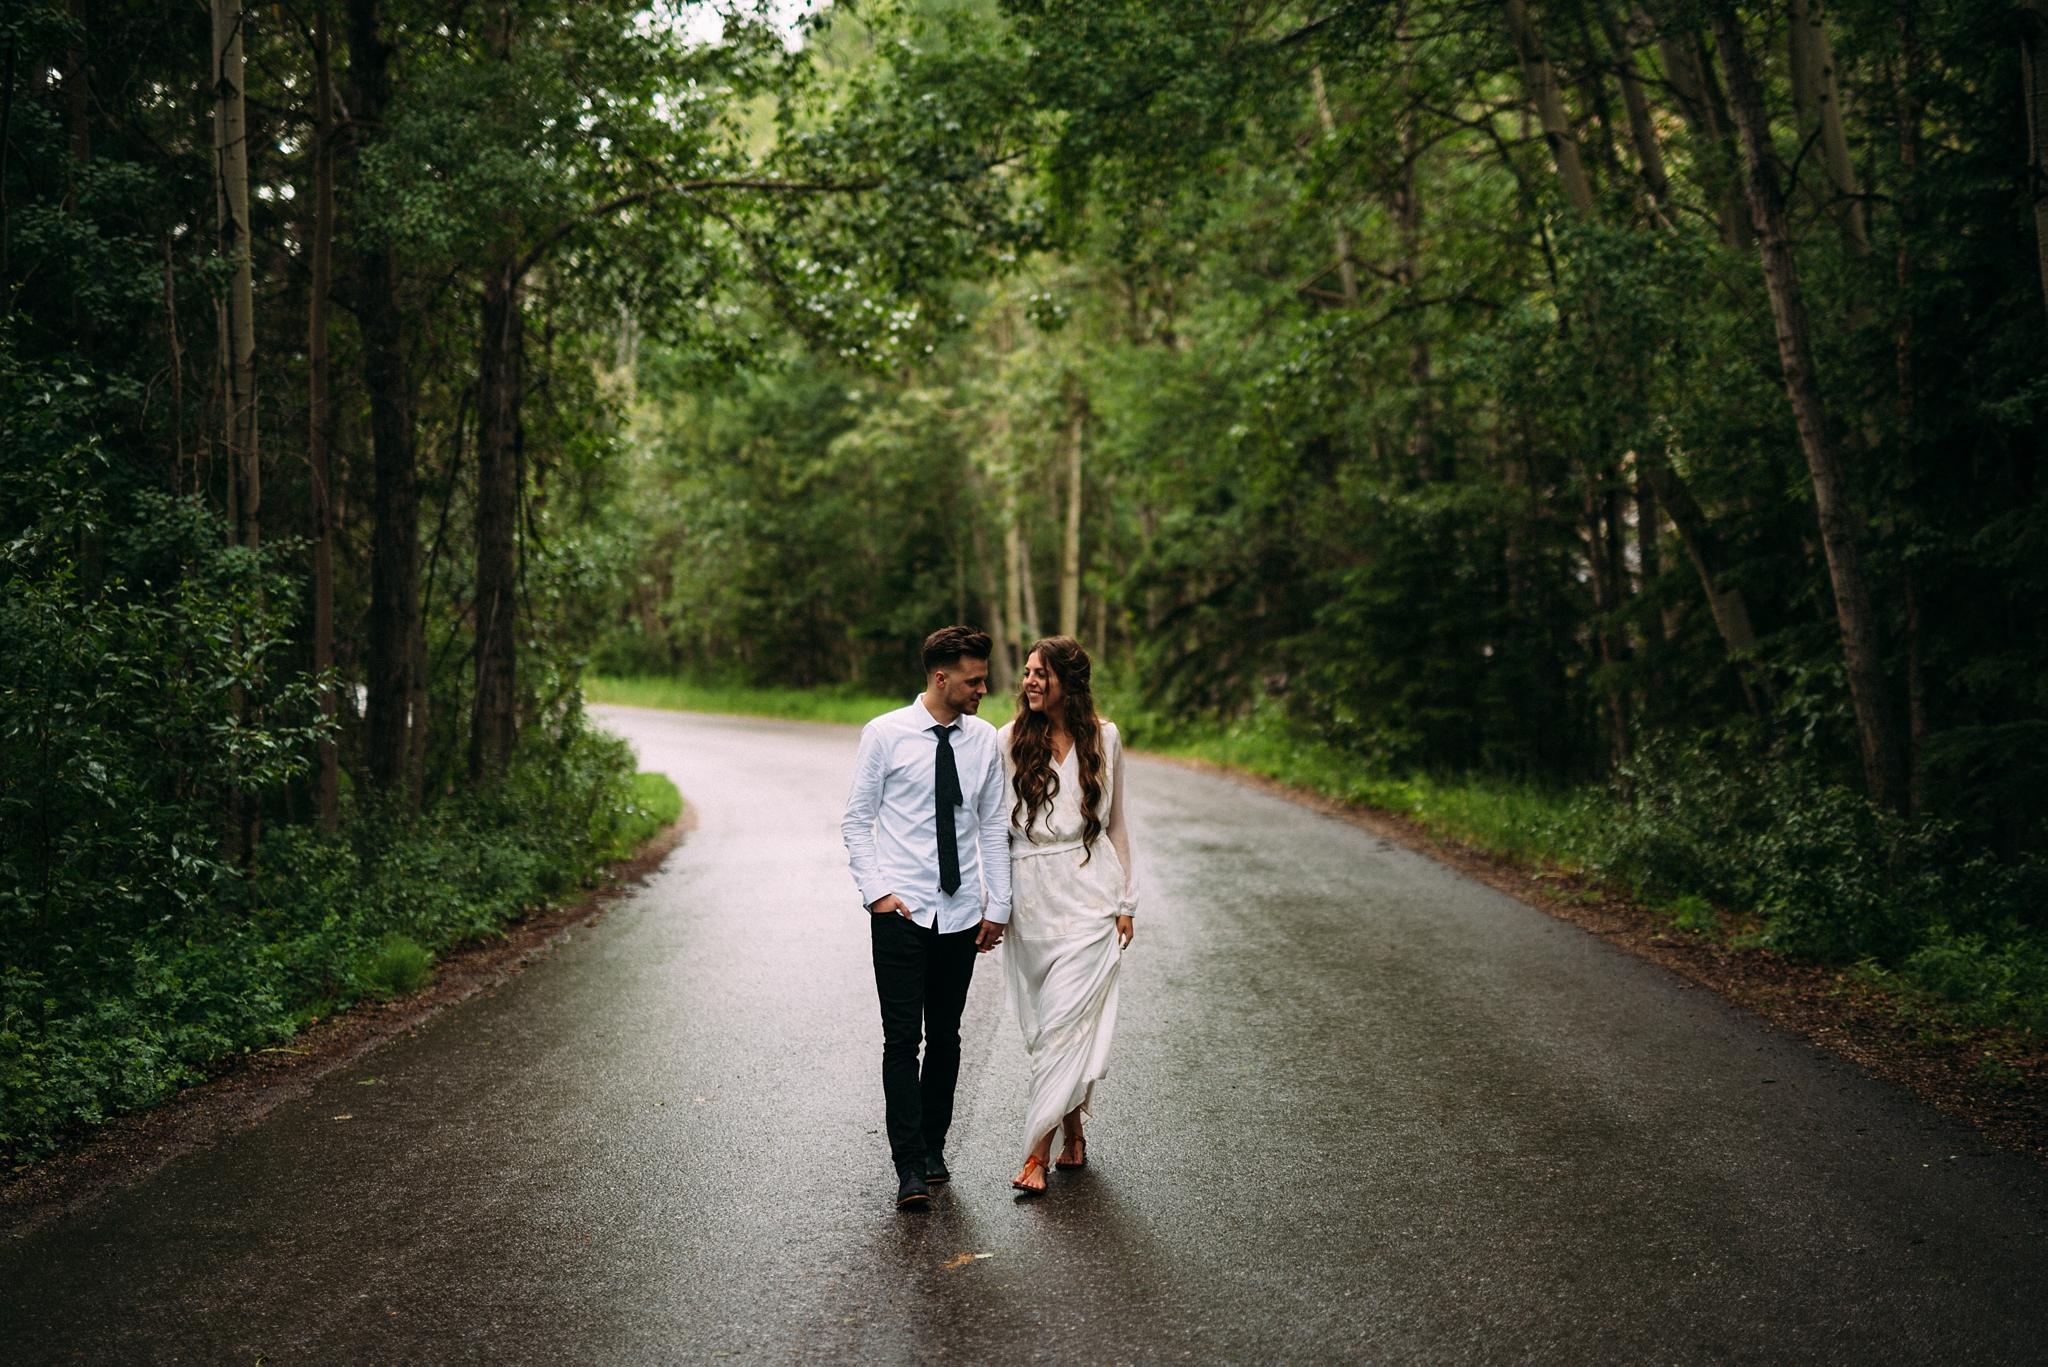 kaihla_tonai_intimate_wedding_elopement_photographer_4147